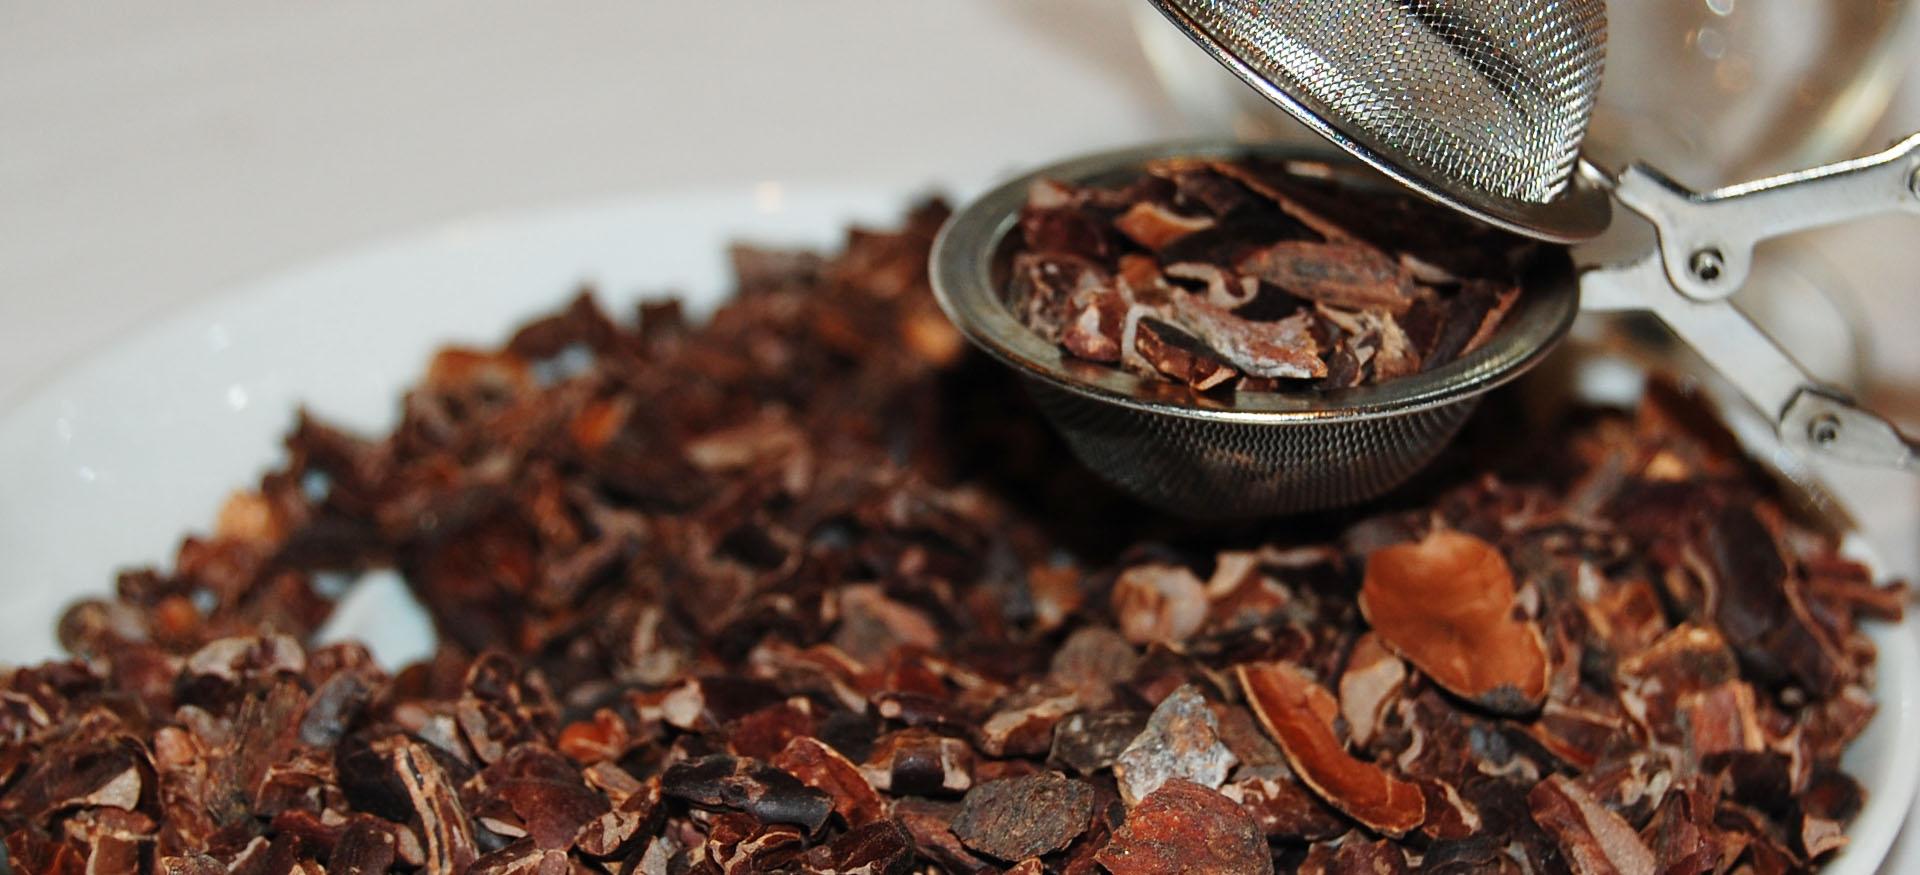 Koko Monk Cacao Brews and Teas